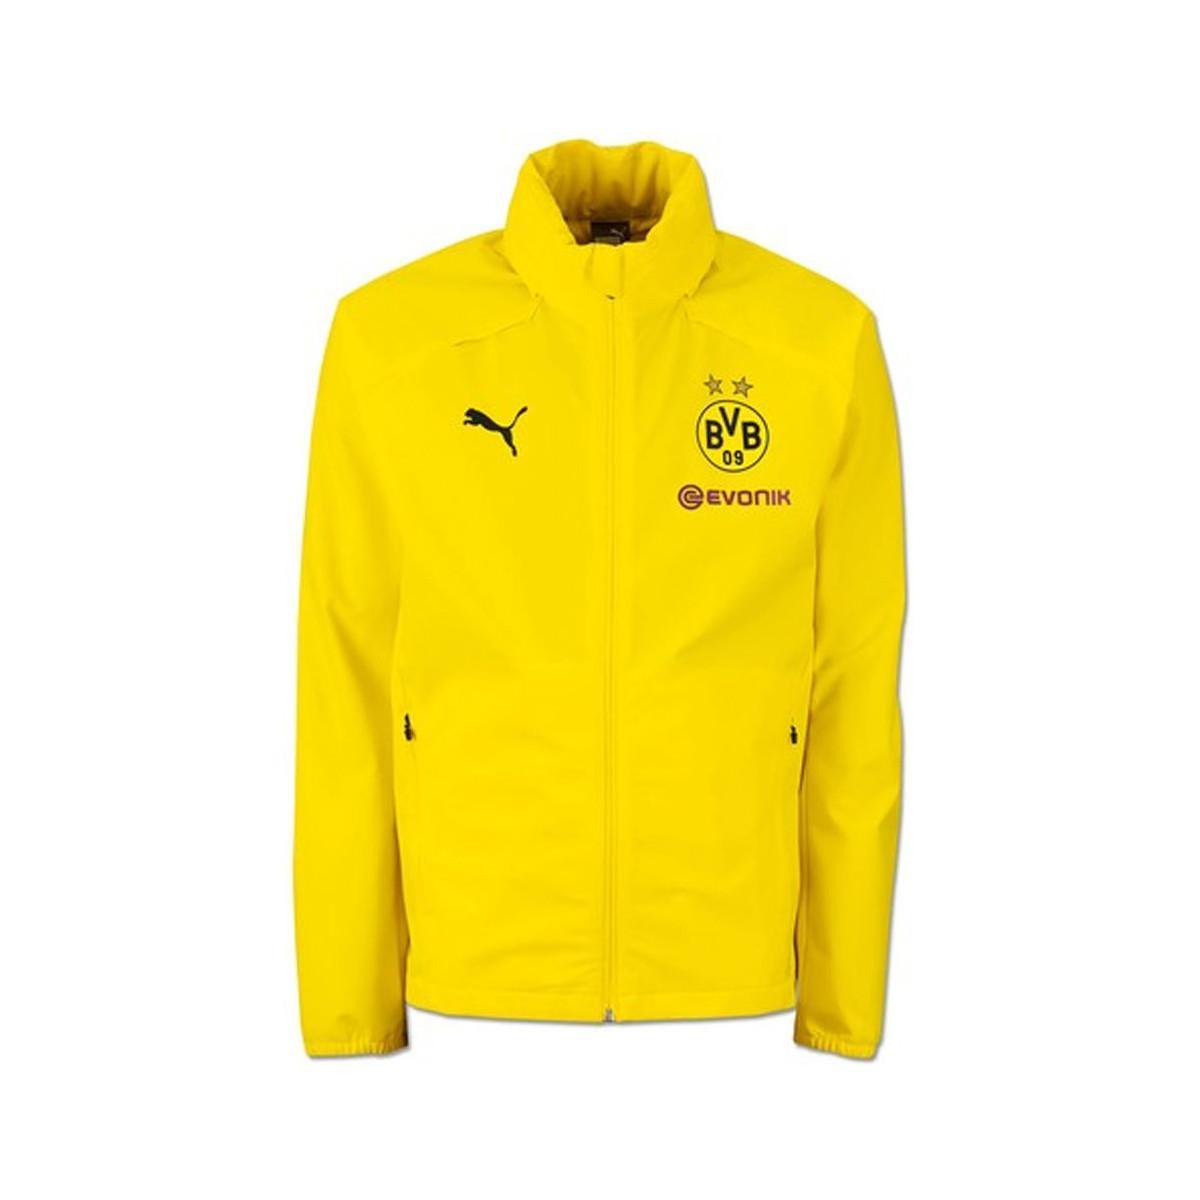 6c64e77c0208 PUMA 2018-2019 Borussia Dortmund Rain Jacket - Kids Men s Tracksuit ...